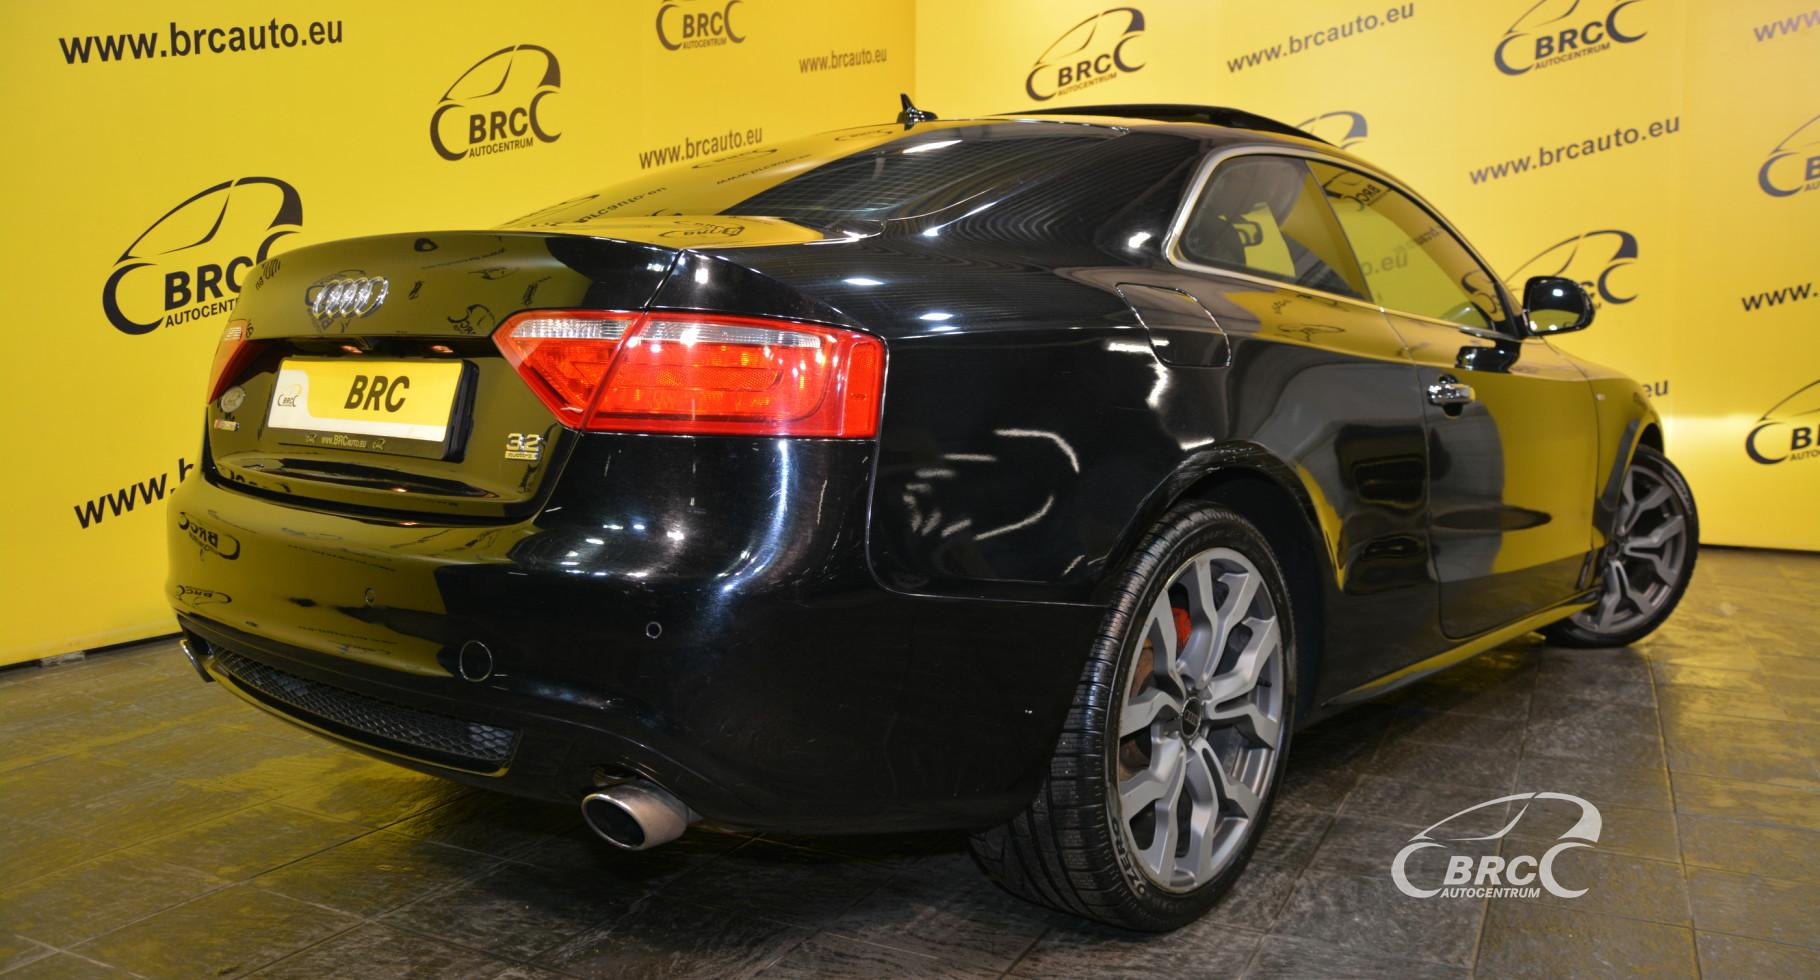 Audi A5 3.2i Quattro Sline Automatas